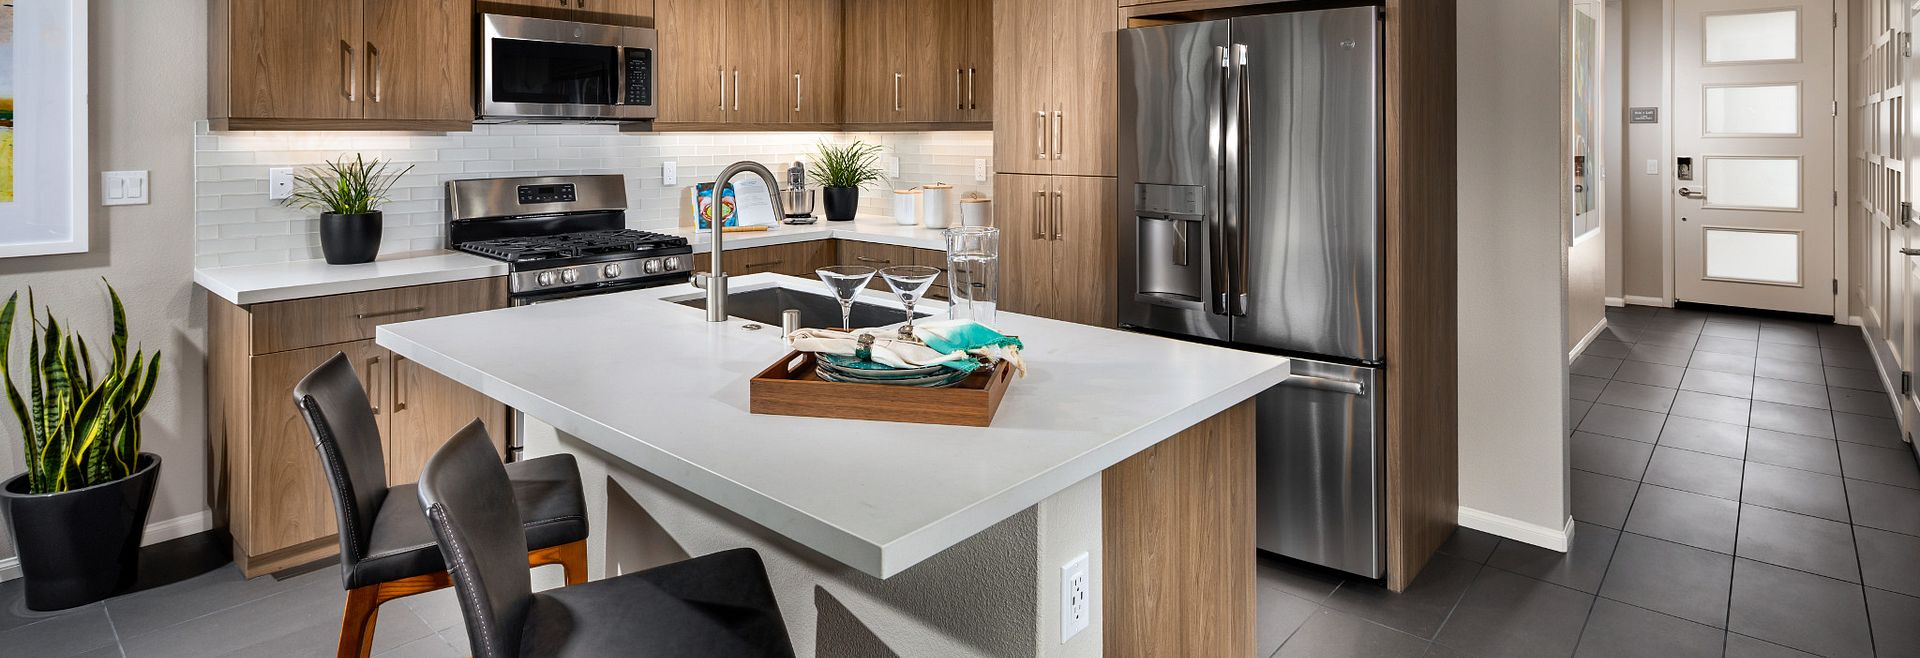 Aria Plan Kitchen